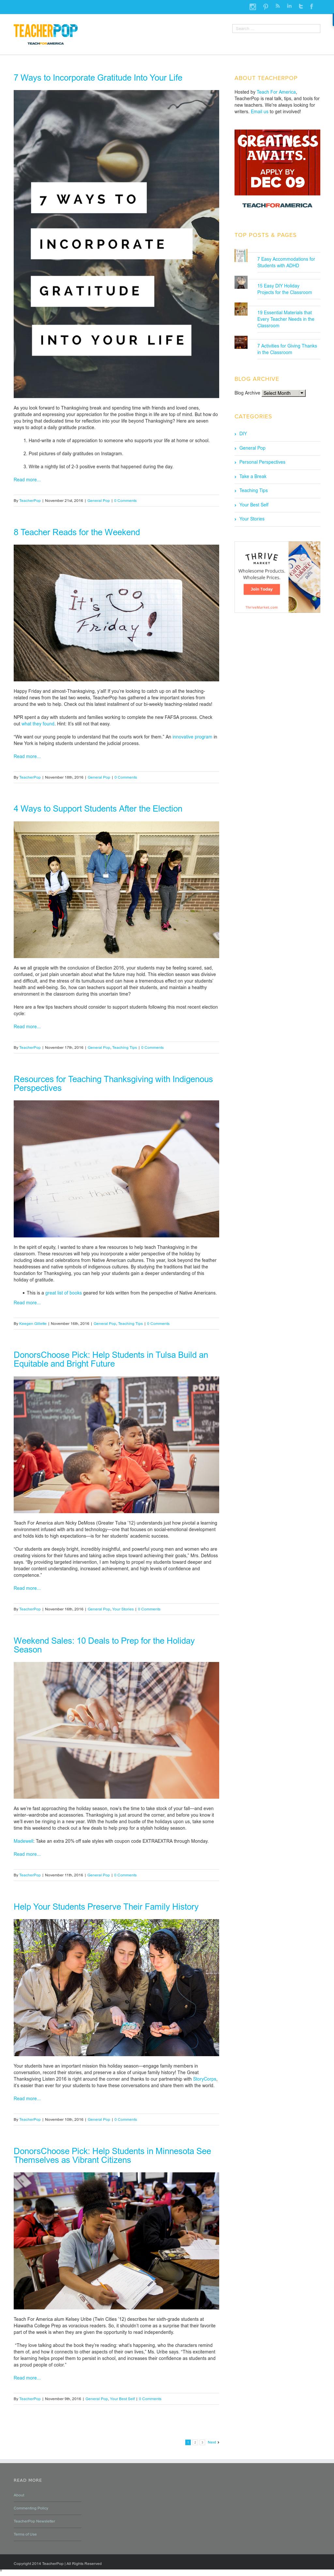 Teacherpop Competitors, Revenue and Employees - Owler Company Profile